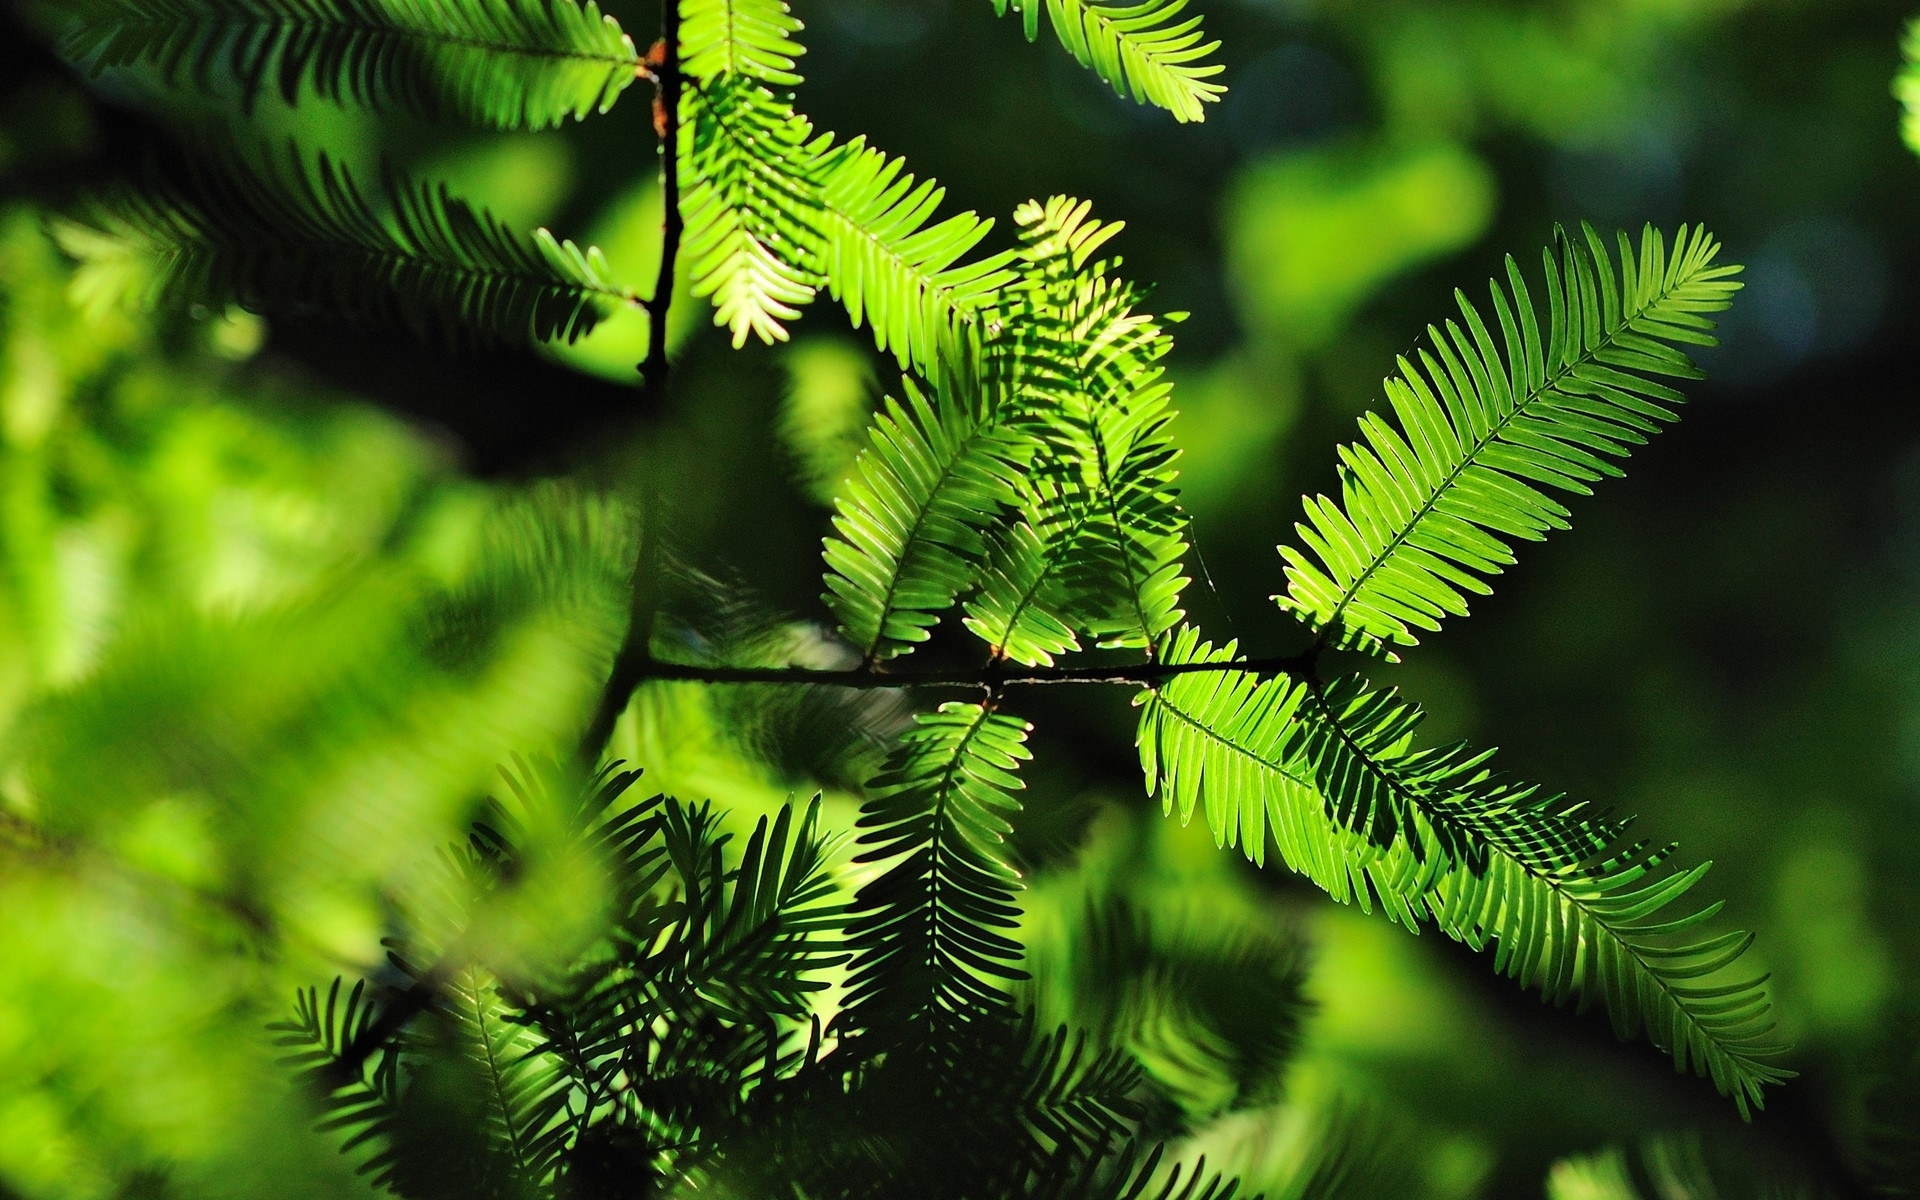 лес зелень ветви  № 2801165 бесплатно